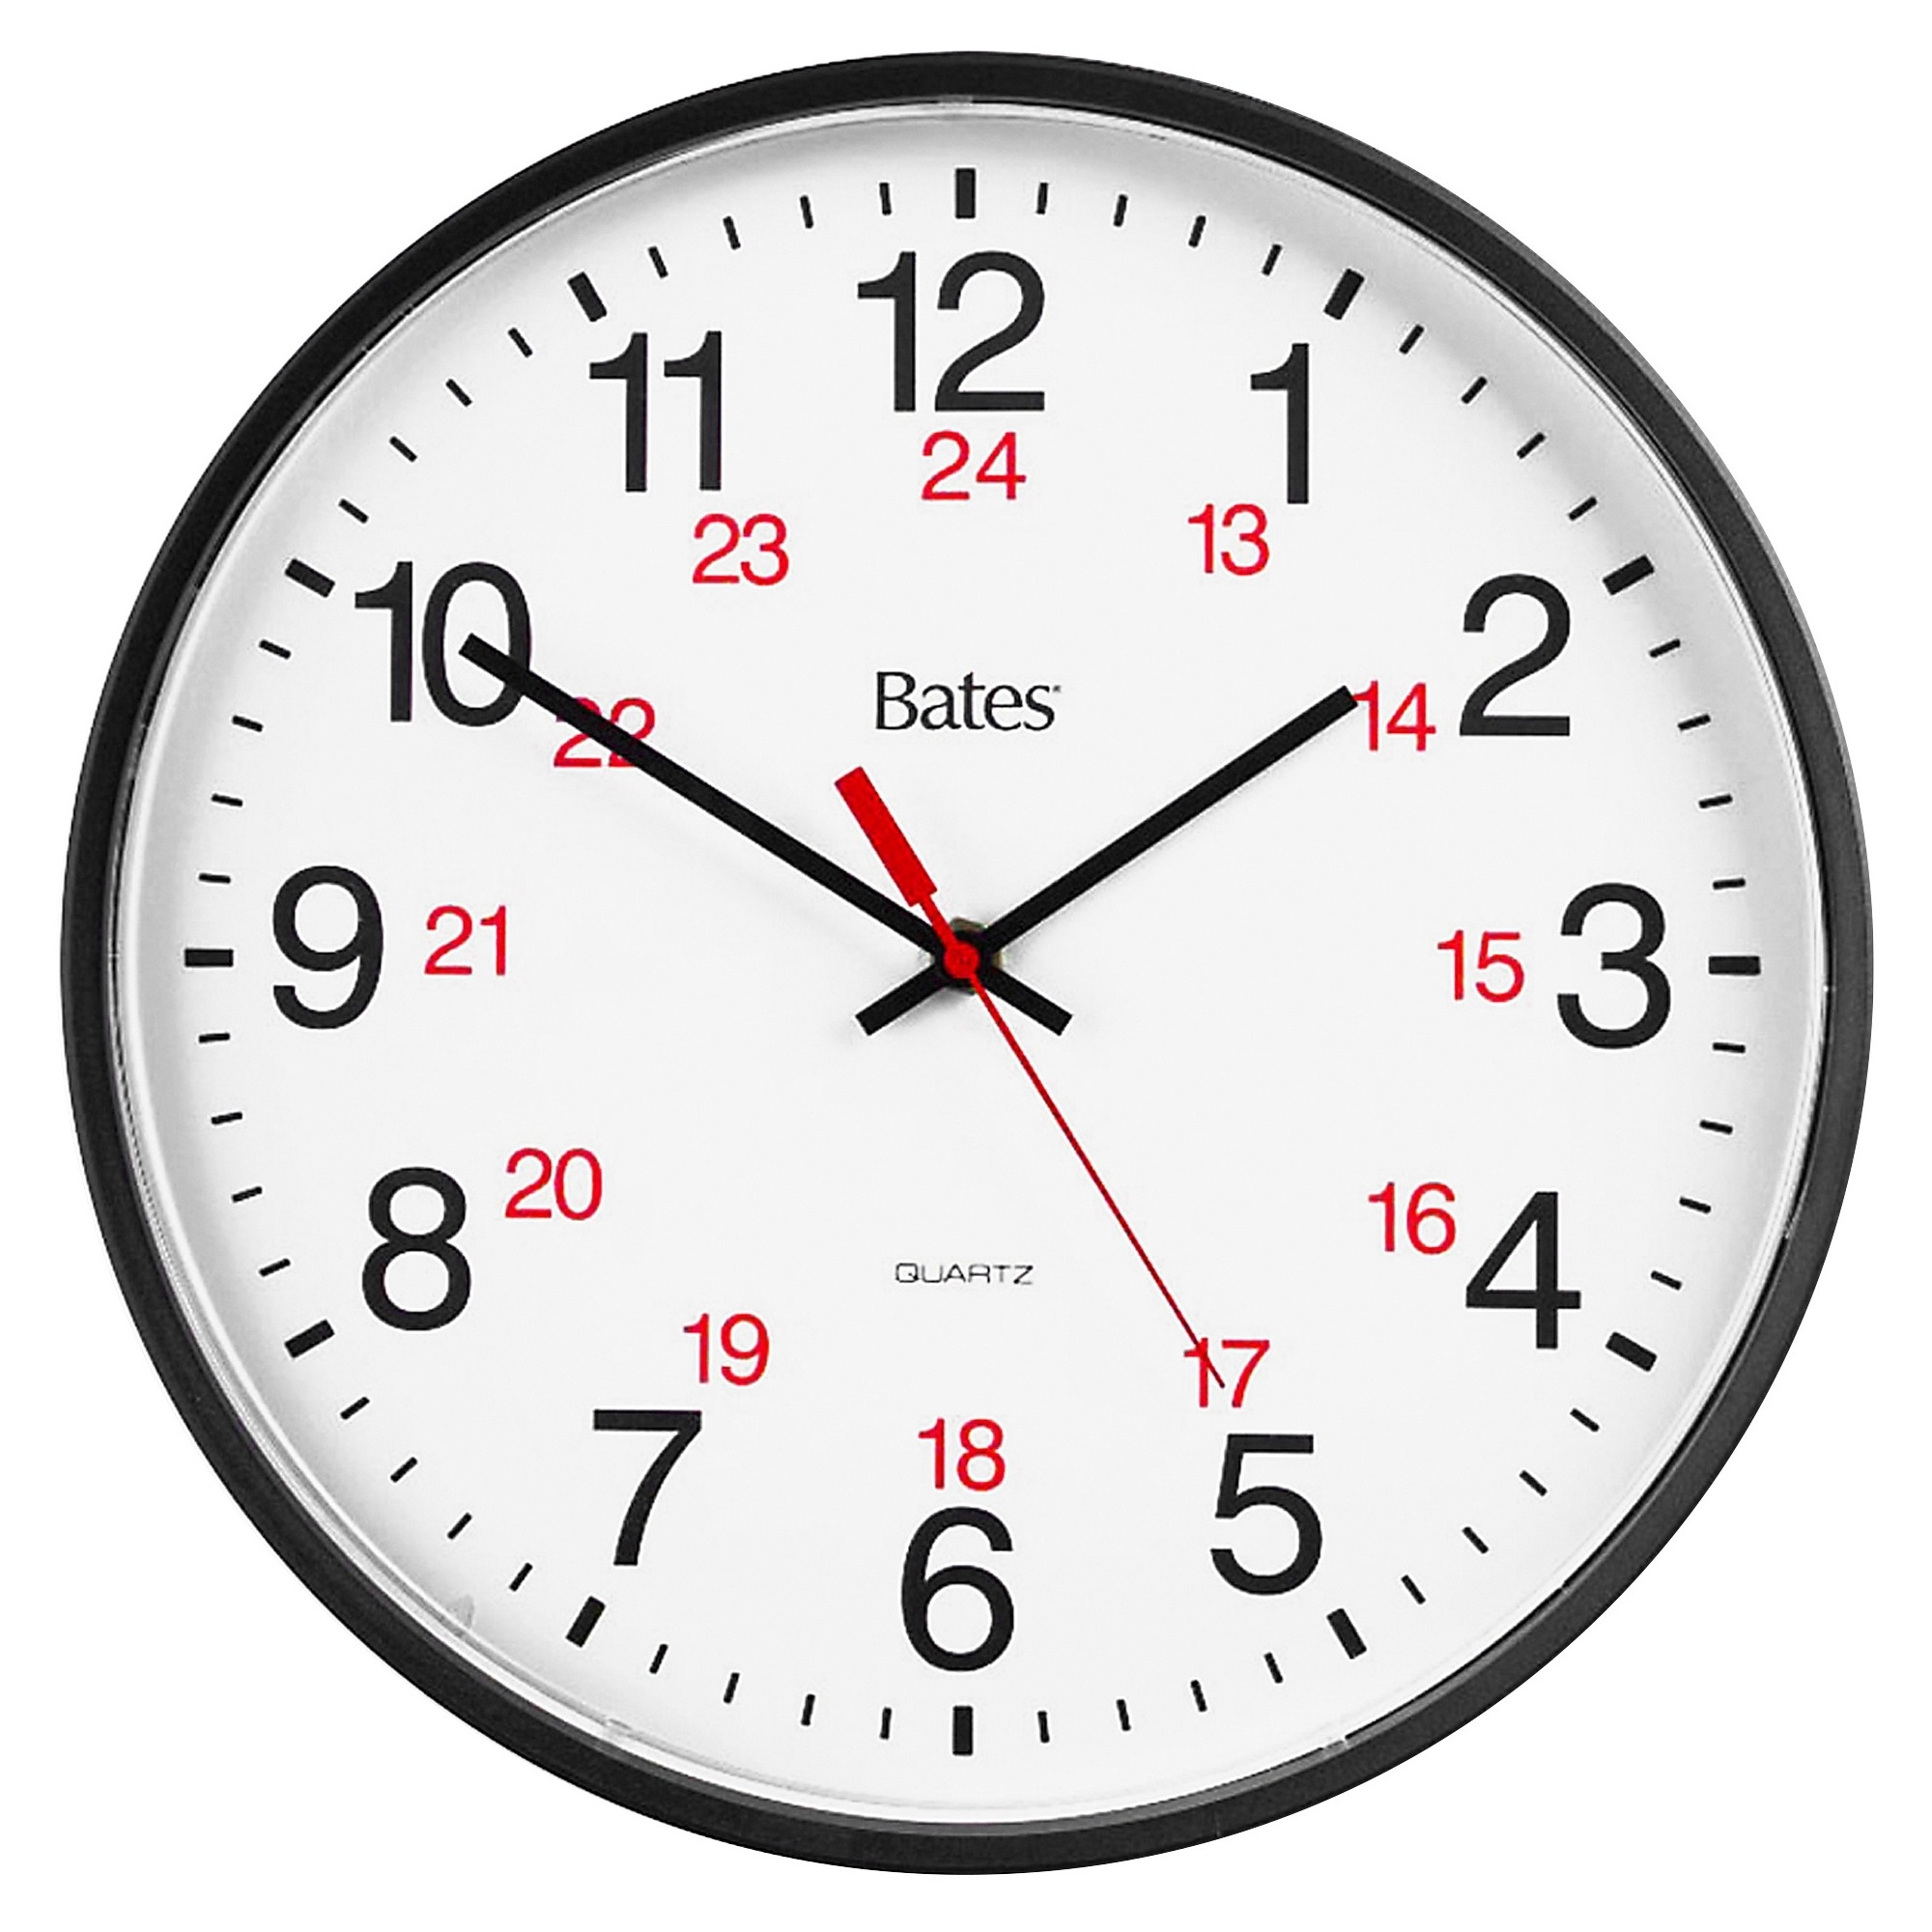 Og Clock To The Hour